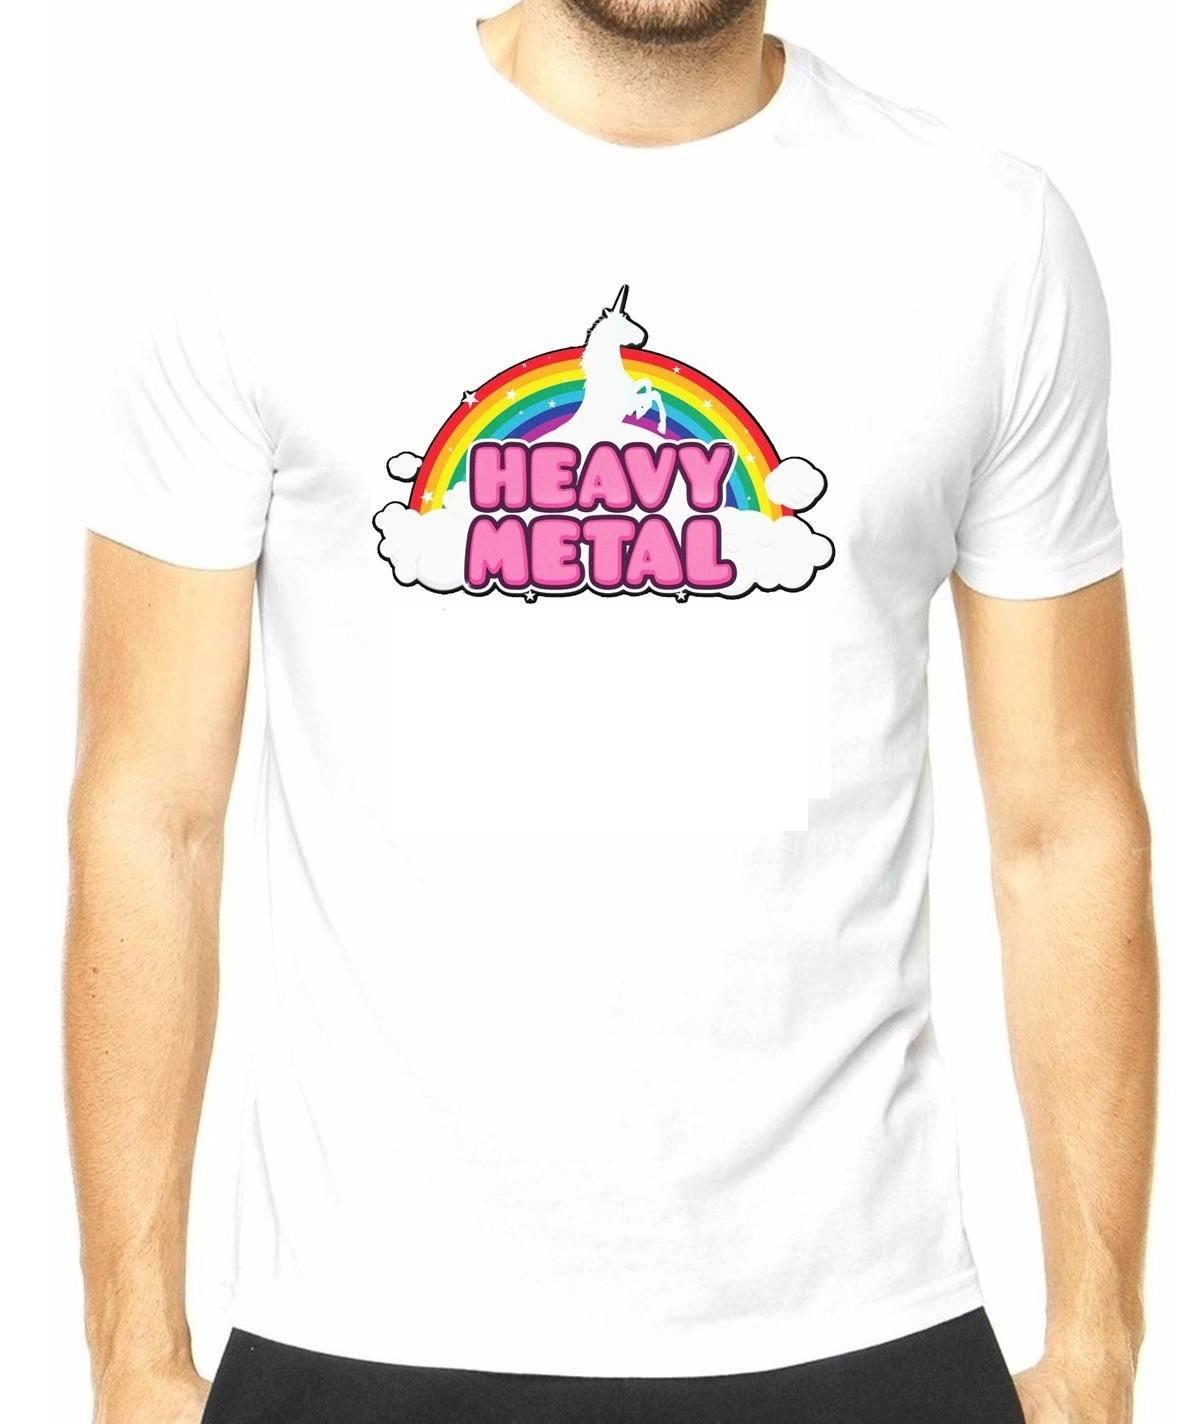 Camiseta masculina Unicórnio Heavy Metal